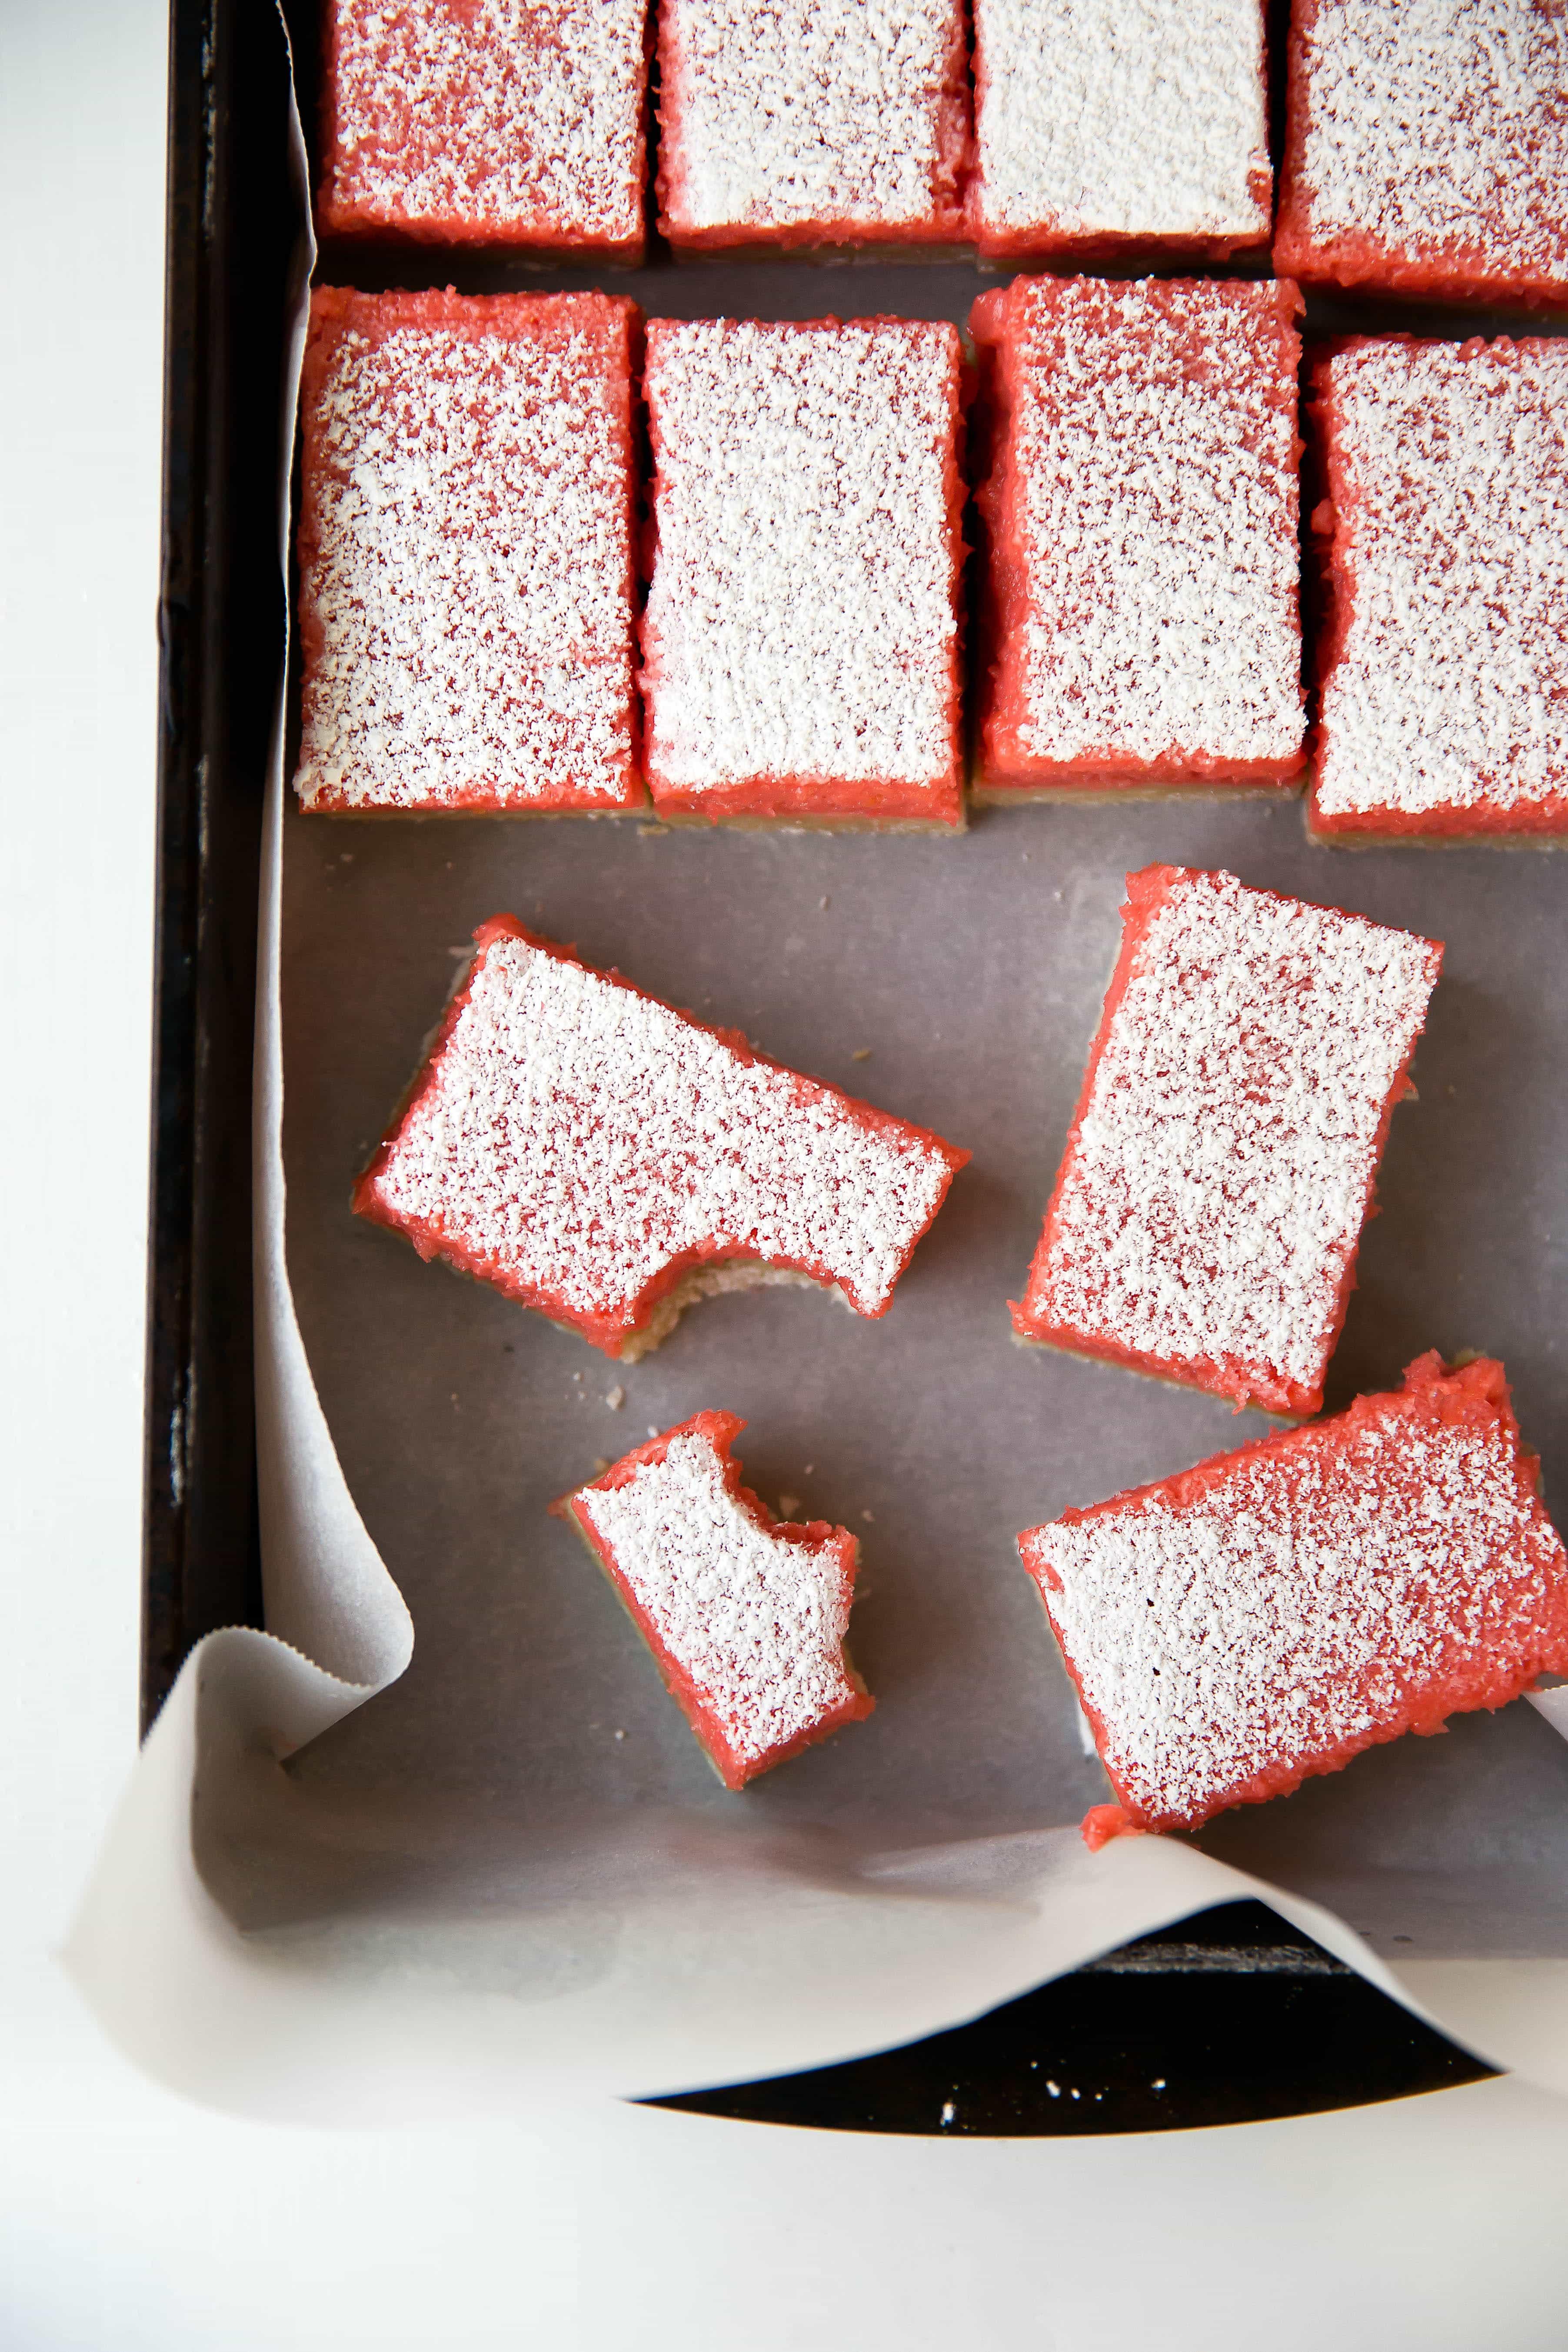 Rhubarb Bars: like a lemon bar, but with a bright and juicy rhubarb twist!